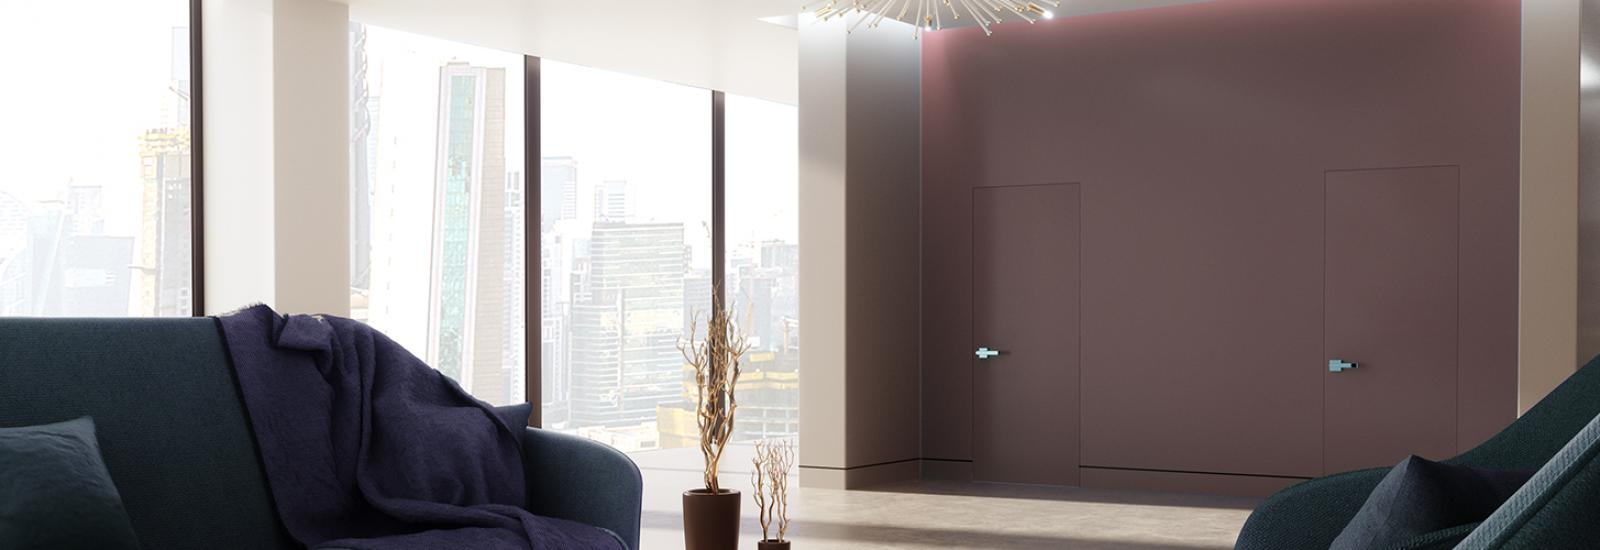 EZ Concept flush frame-less door system